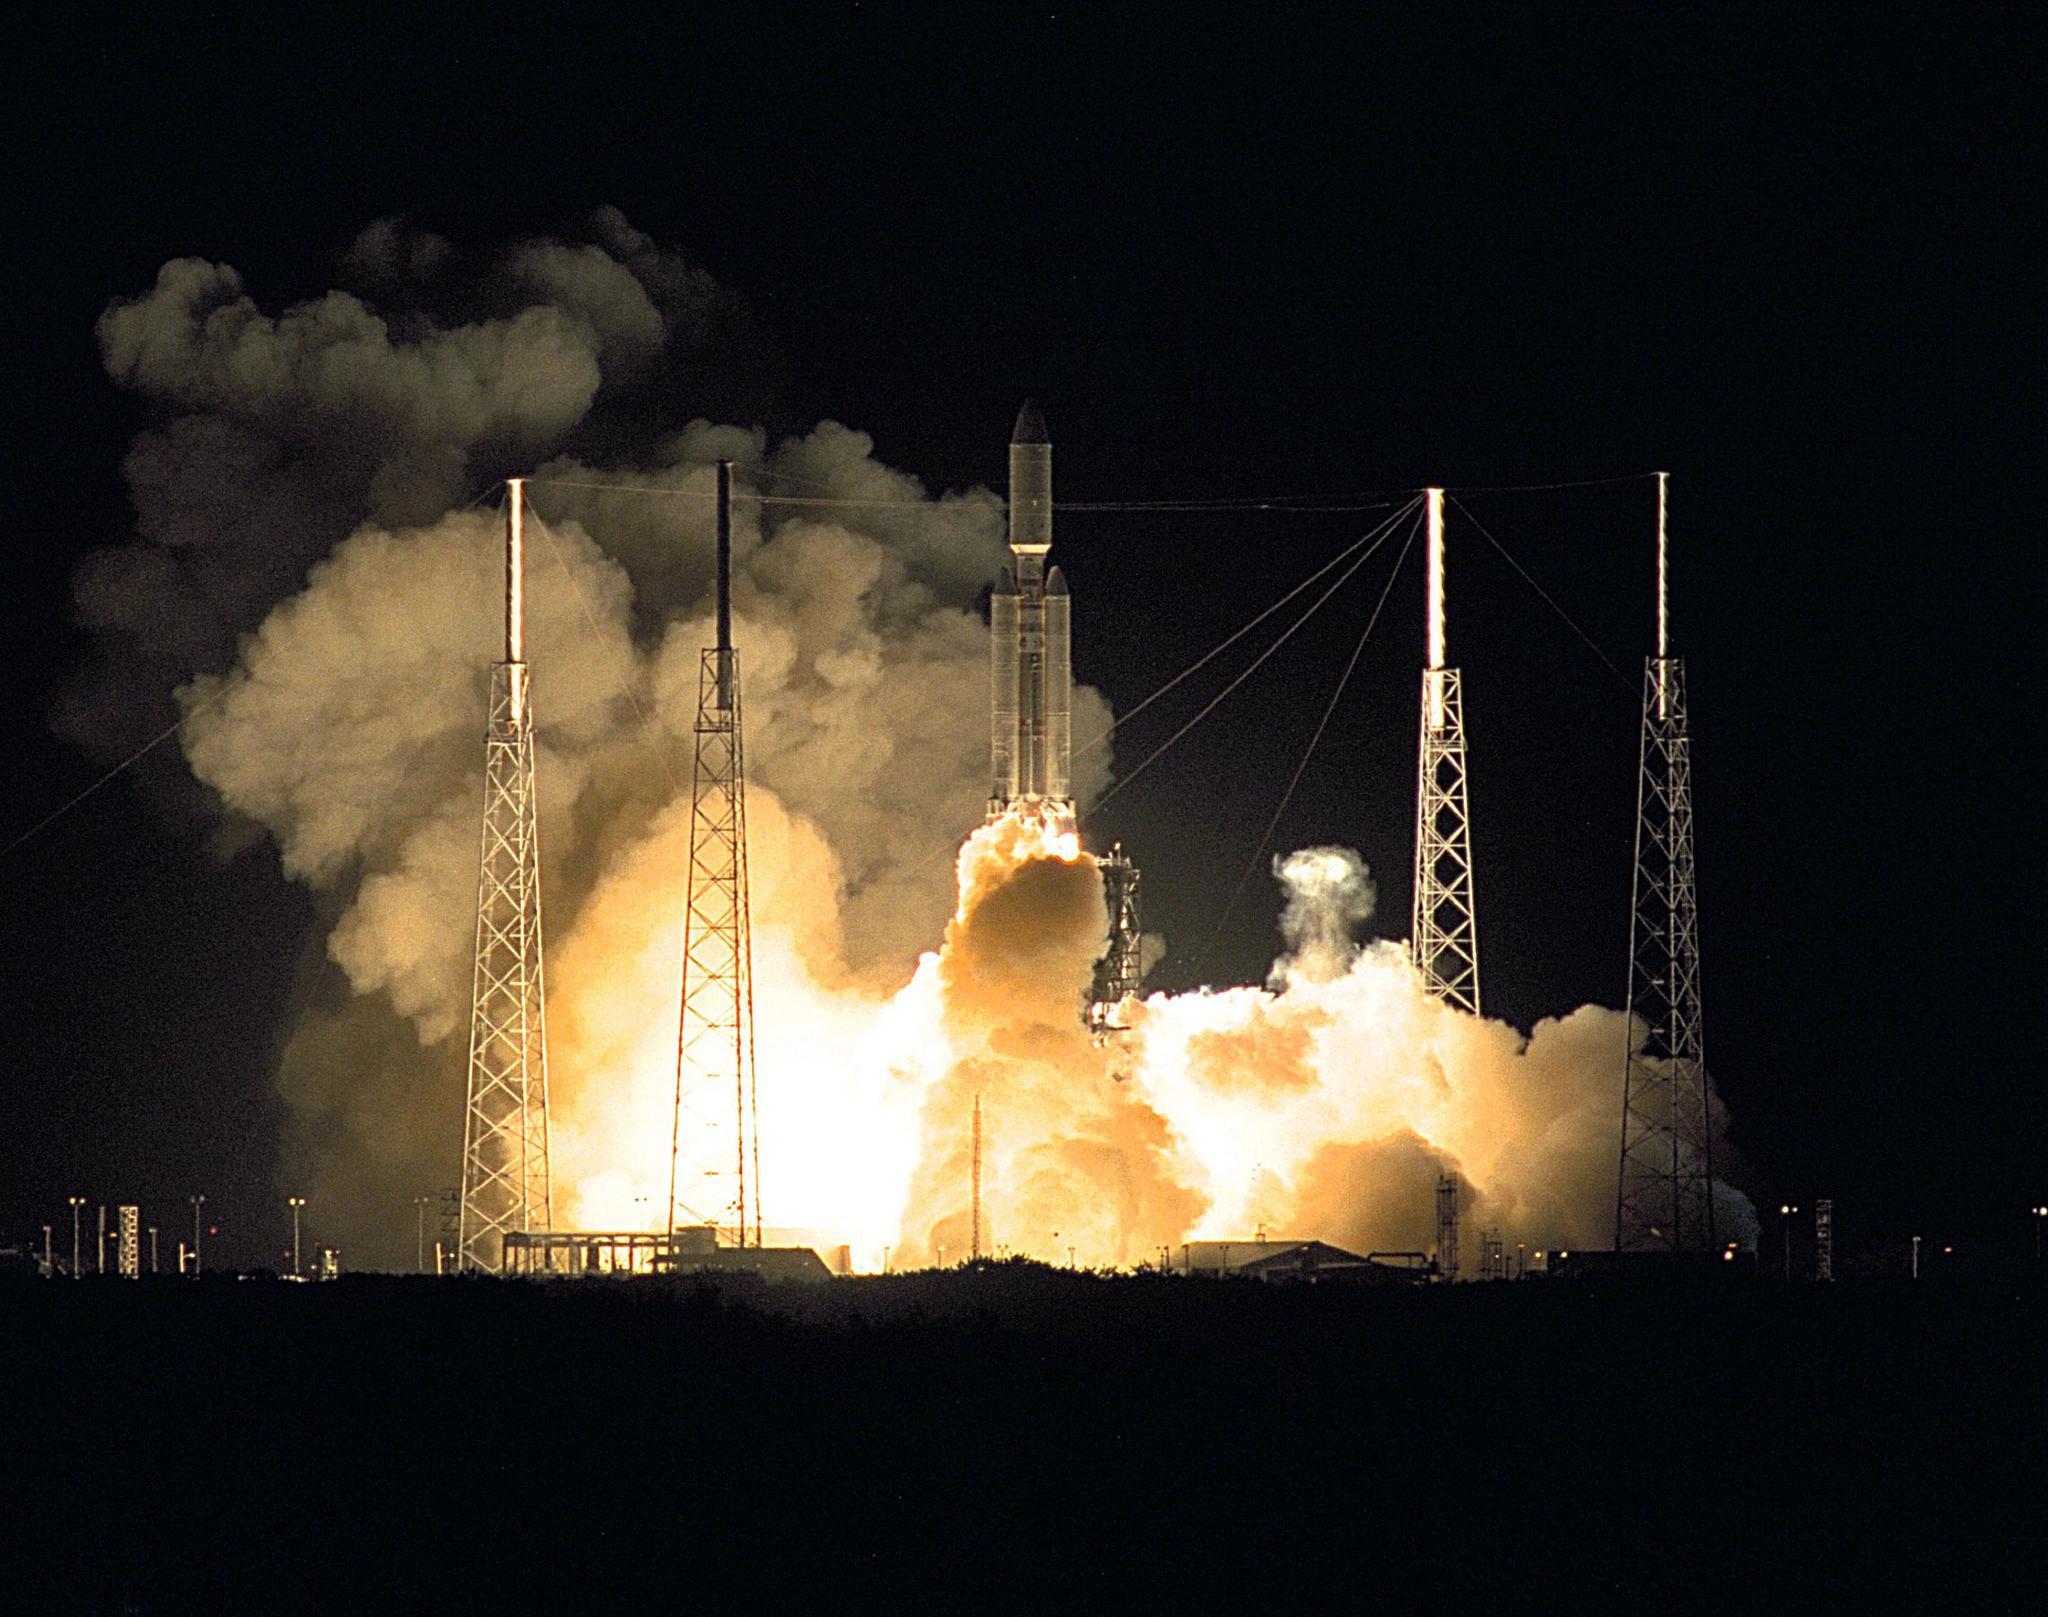 Launch of Cassini orbiter and Huygens probe on Titan IV on Oct. 23, 1997.